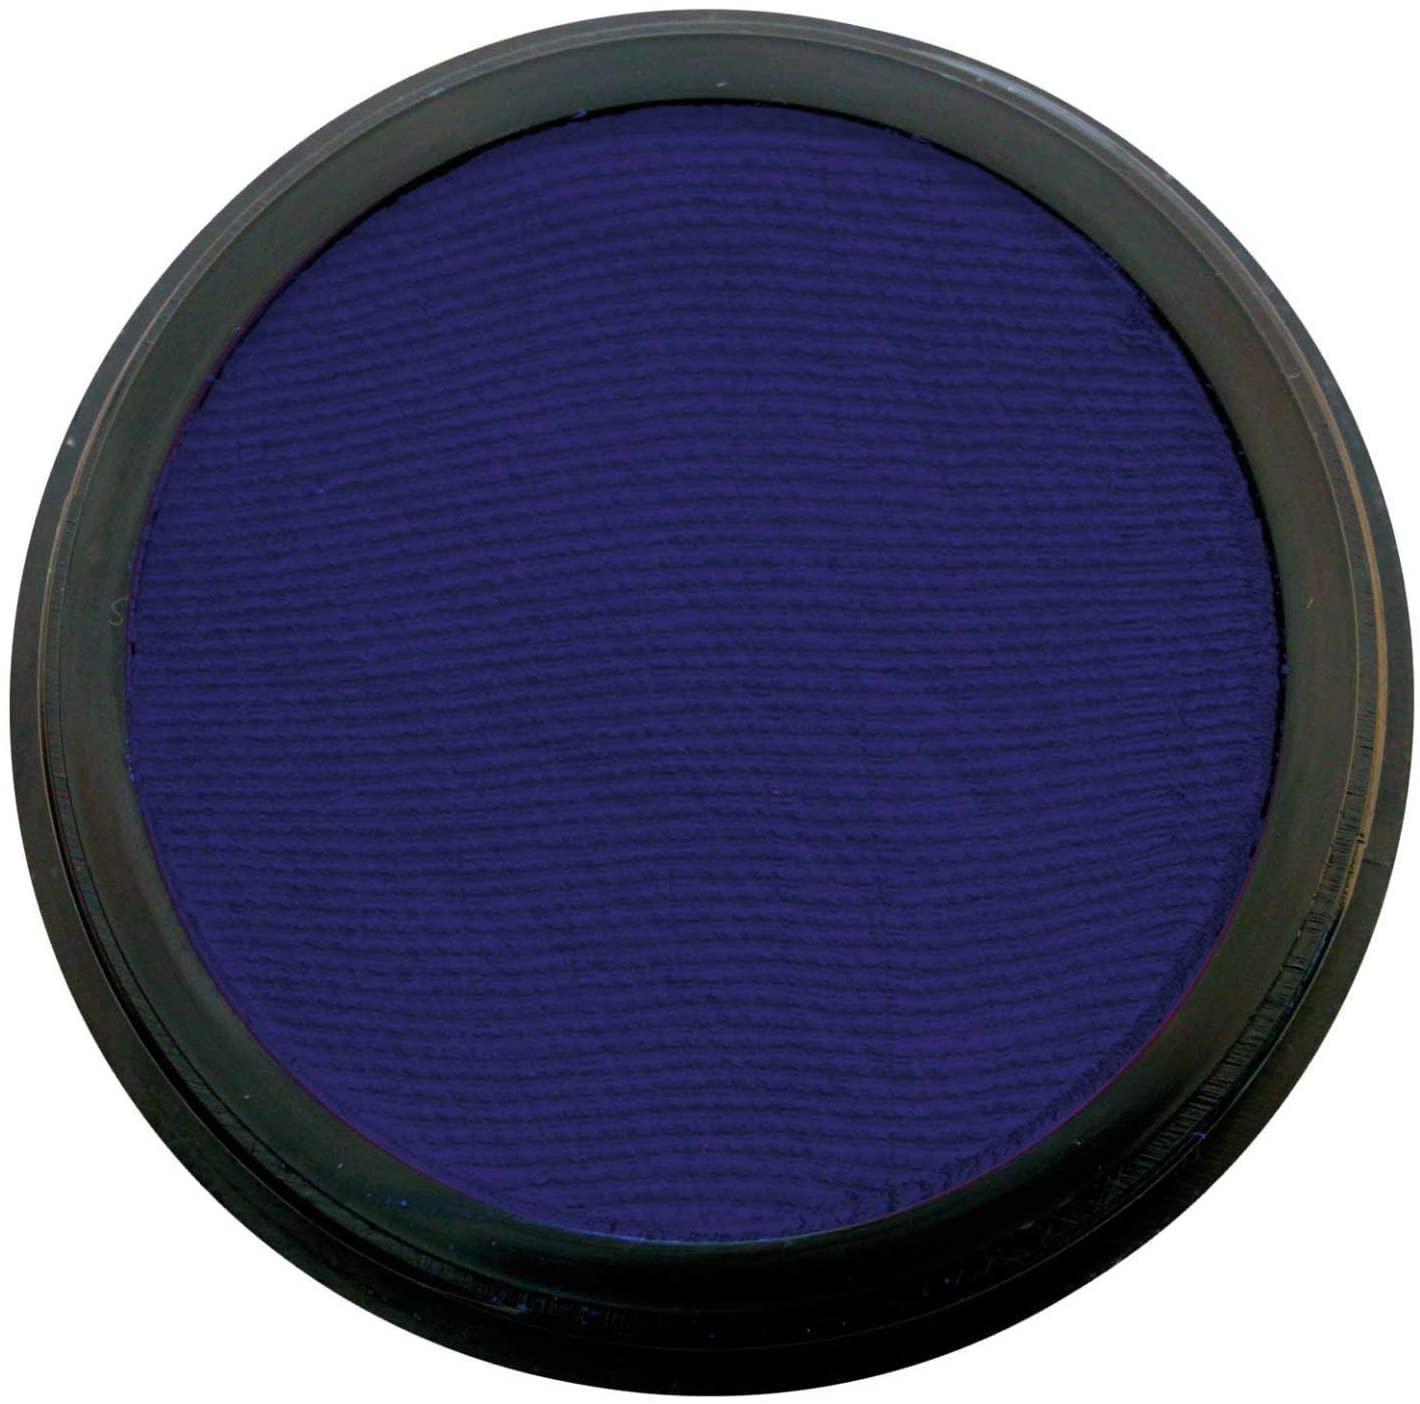 Creative Eulenspiegel 183441 Royal Blue 20 ml/30 g Professional Aqua Make-Up